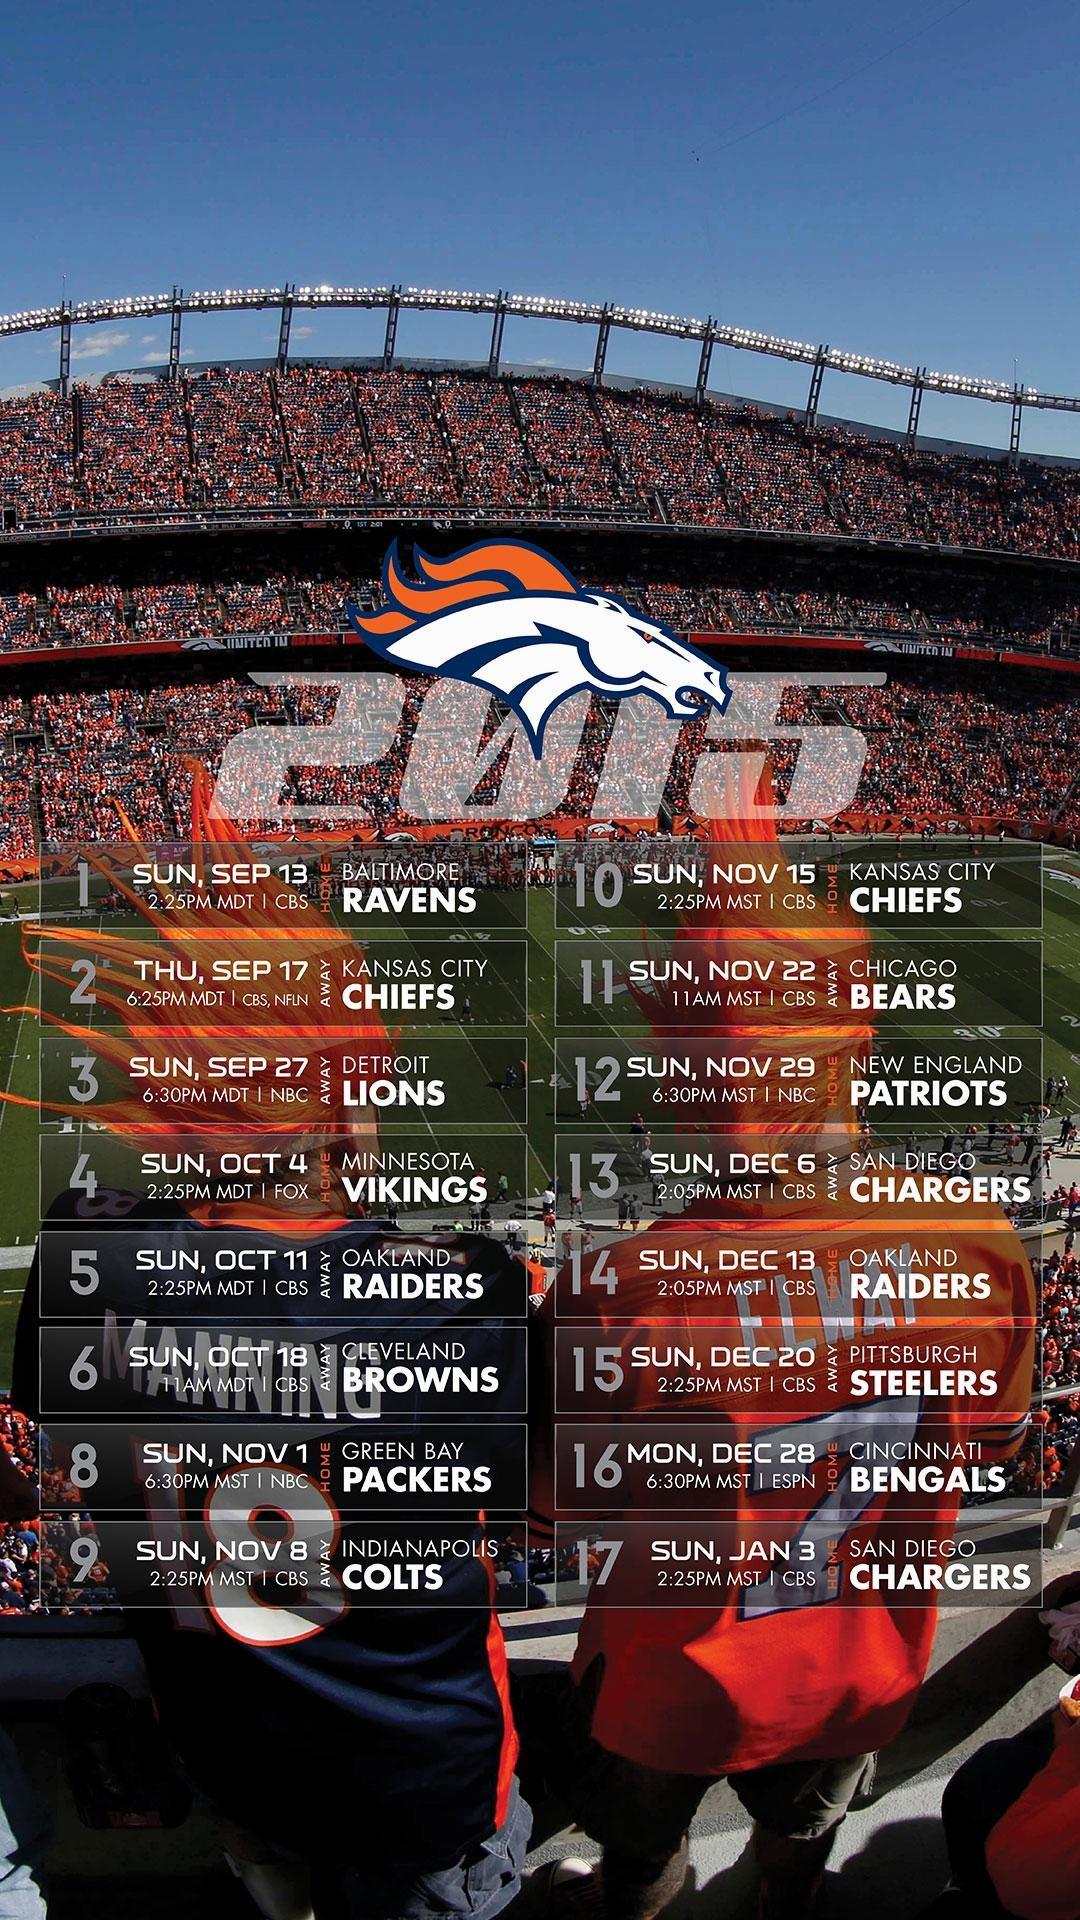 wallpaper.wiki-Denver-Broncos-iPhone-5-Widescreen-Wallpaper-